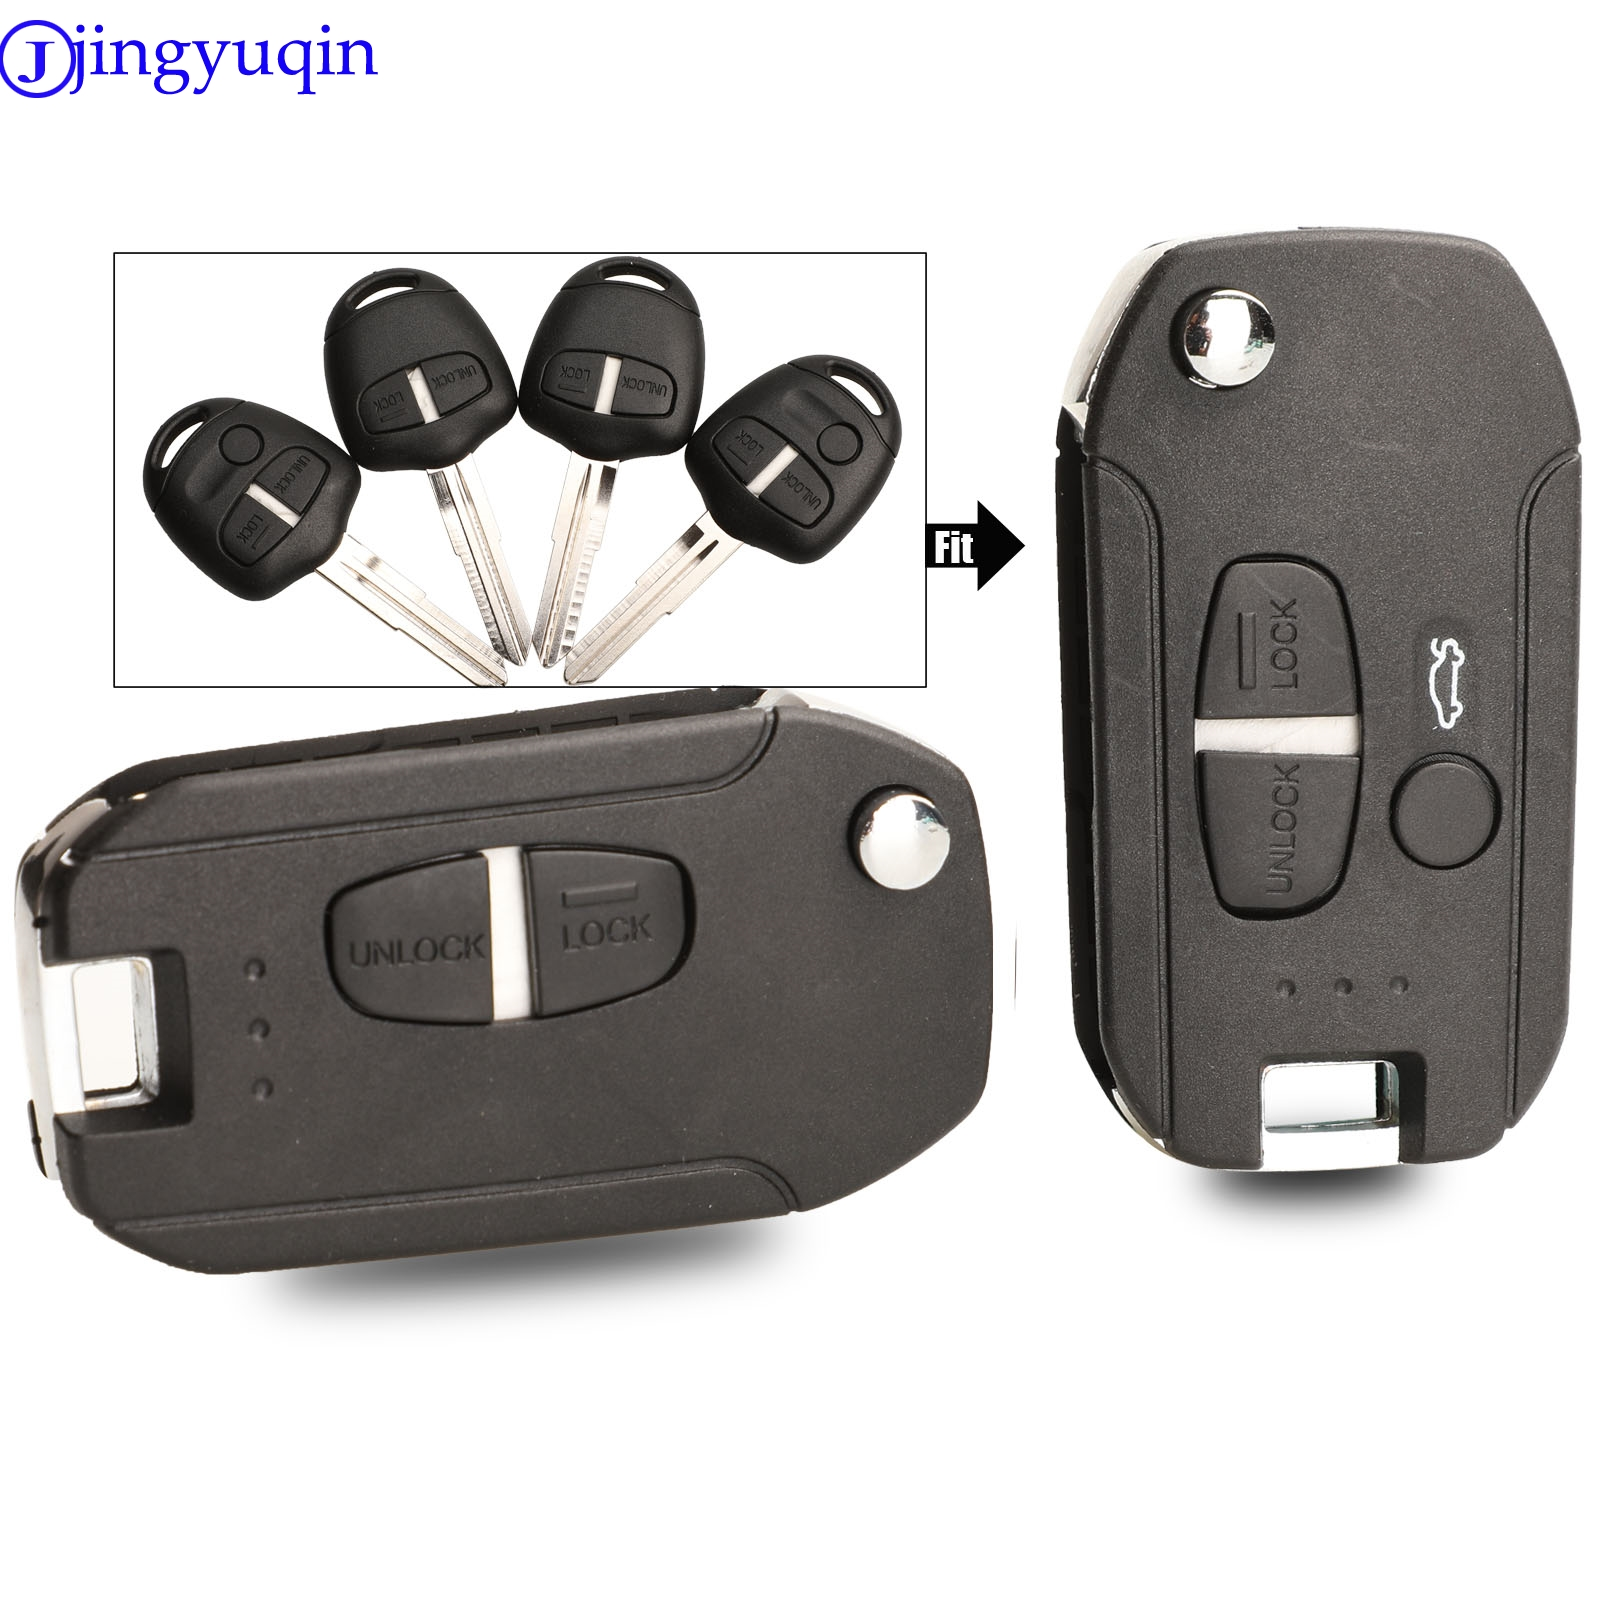 Jingyuqin 2/3 кнопки модифицированный чехол для ключей чехол для Mitsubishi Lancer Evo Colt Outlander Mirage Keyless (правое лезвие)